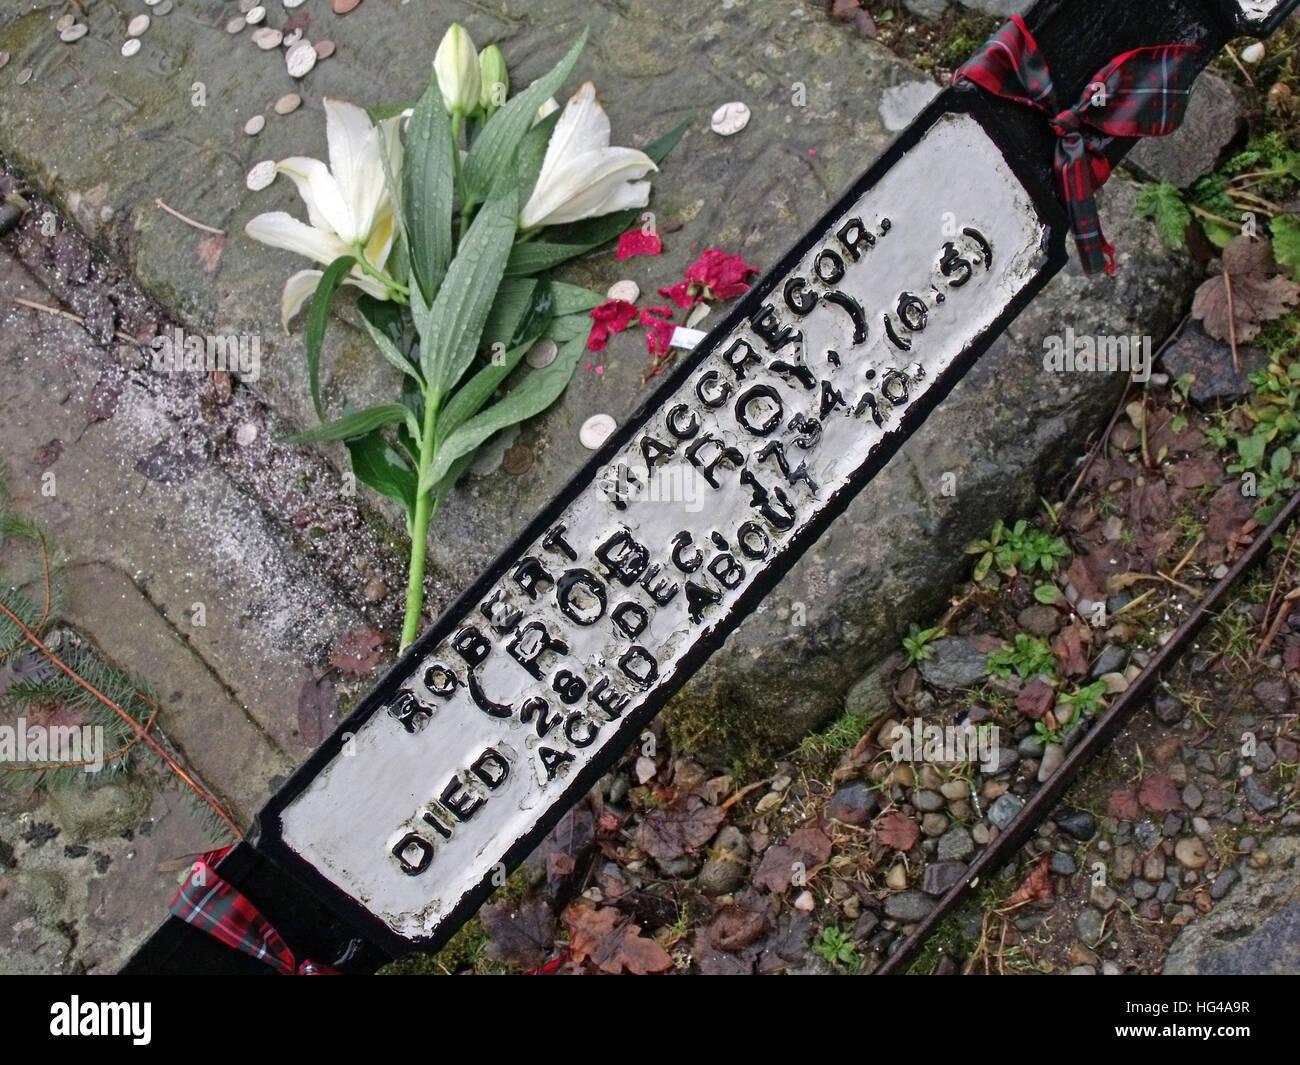 Nationalism,Roy,MacGregor,red,hair,haired,hero,martyr,outlaw,Balquidder,Inverlochlarig,Beg,graveyard,burial,buried,tomb,Robert,MacGregor,flower,flowers,MacGregor,Despite,Them,tarten,tartan,crest,Scottish